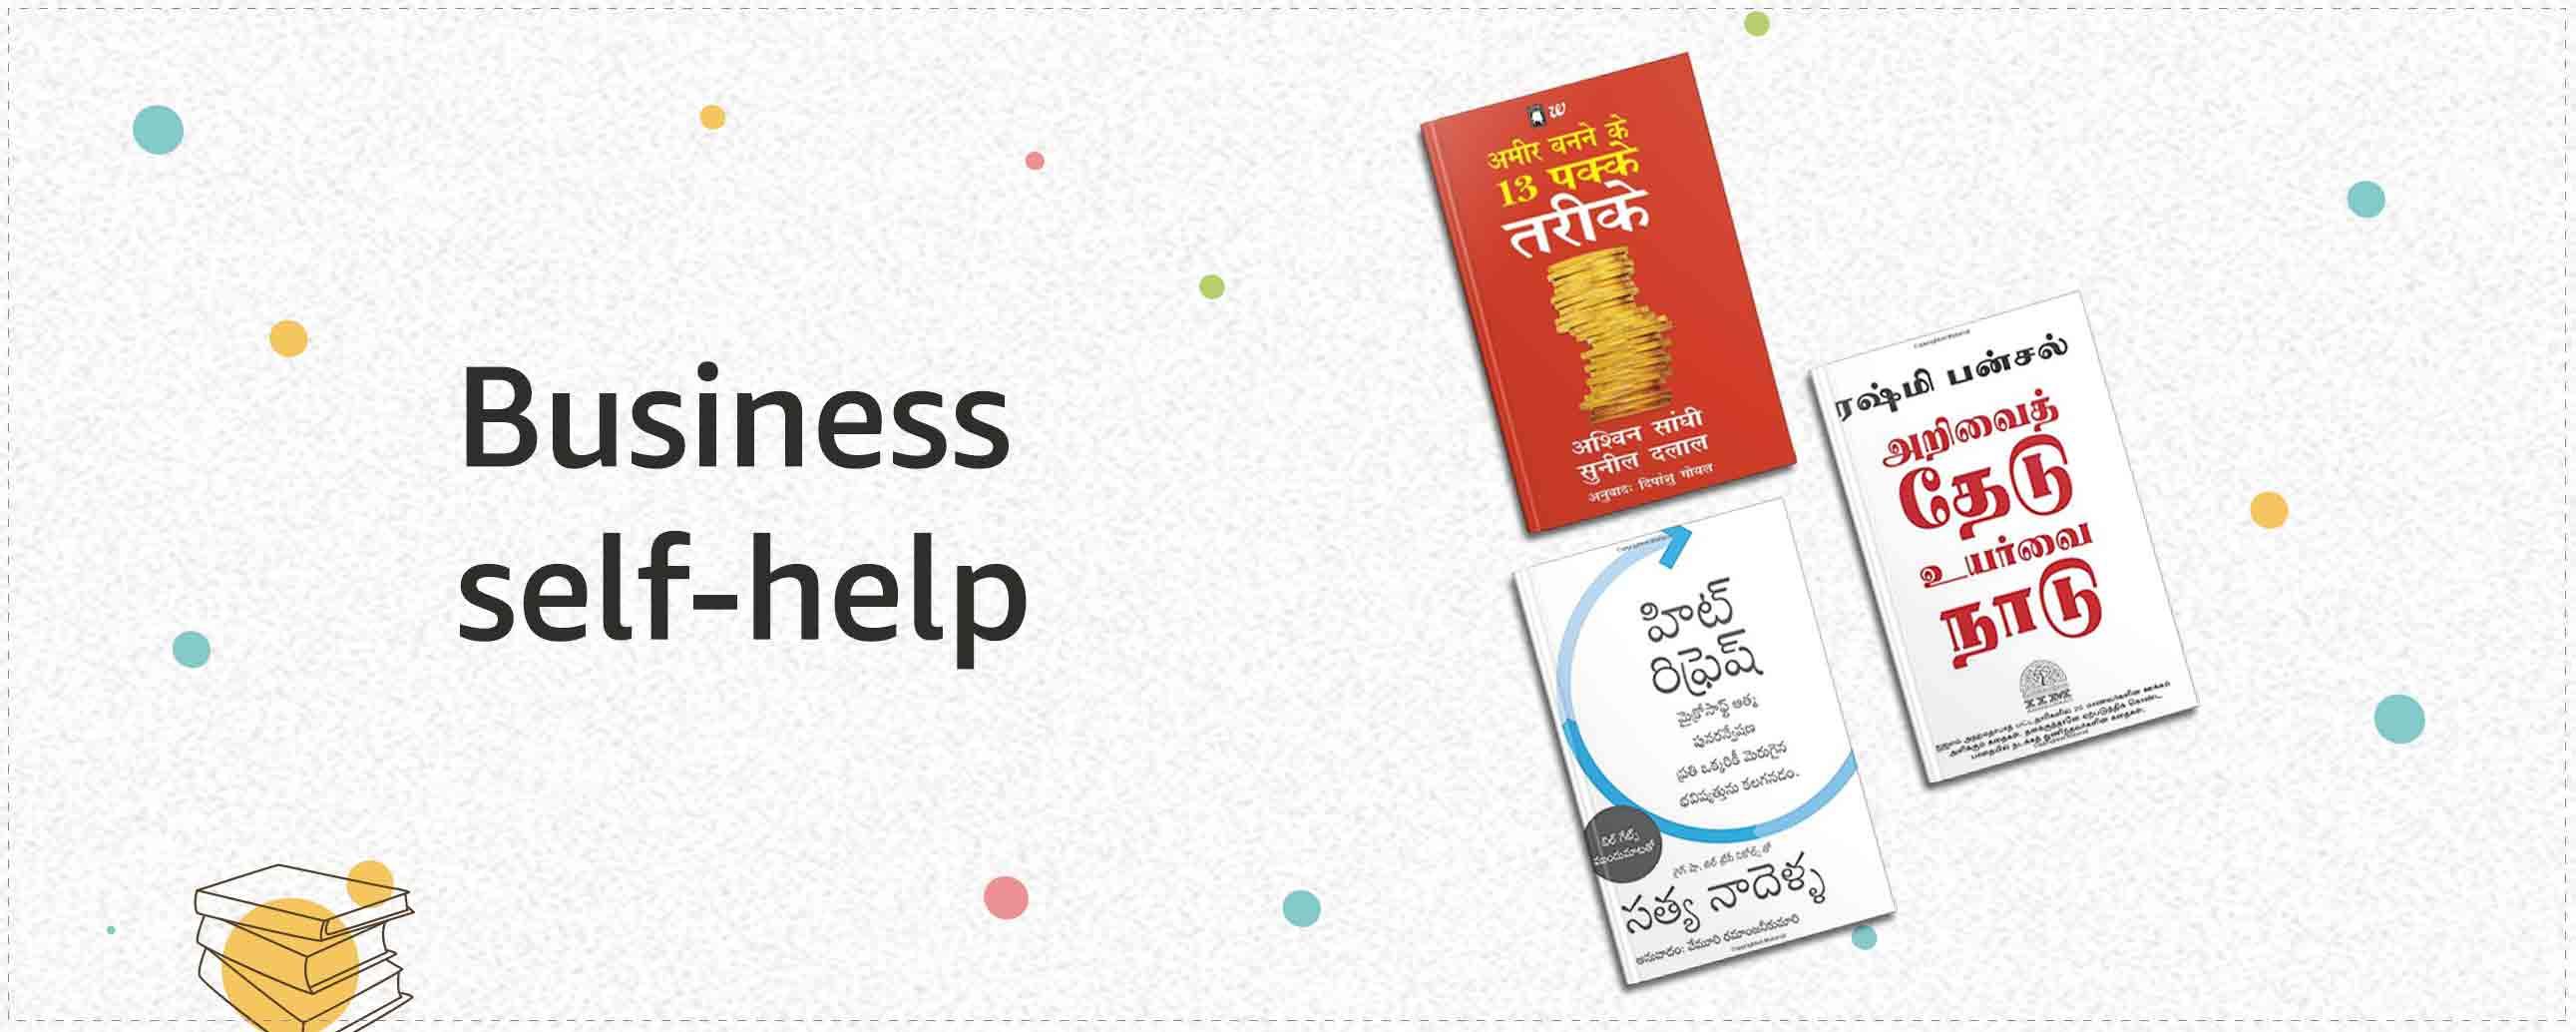 Business Self-help